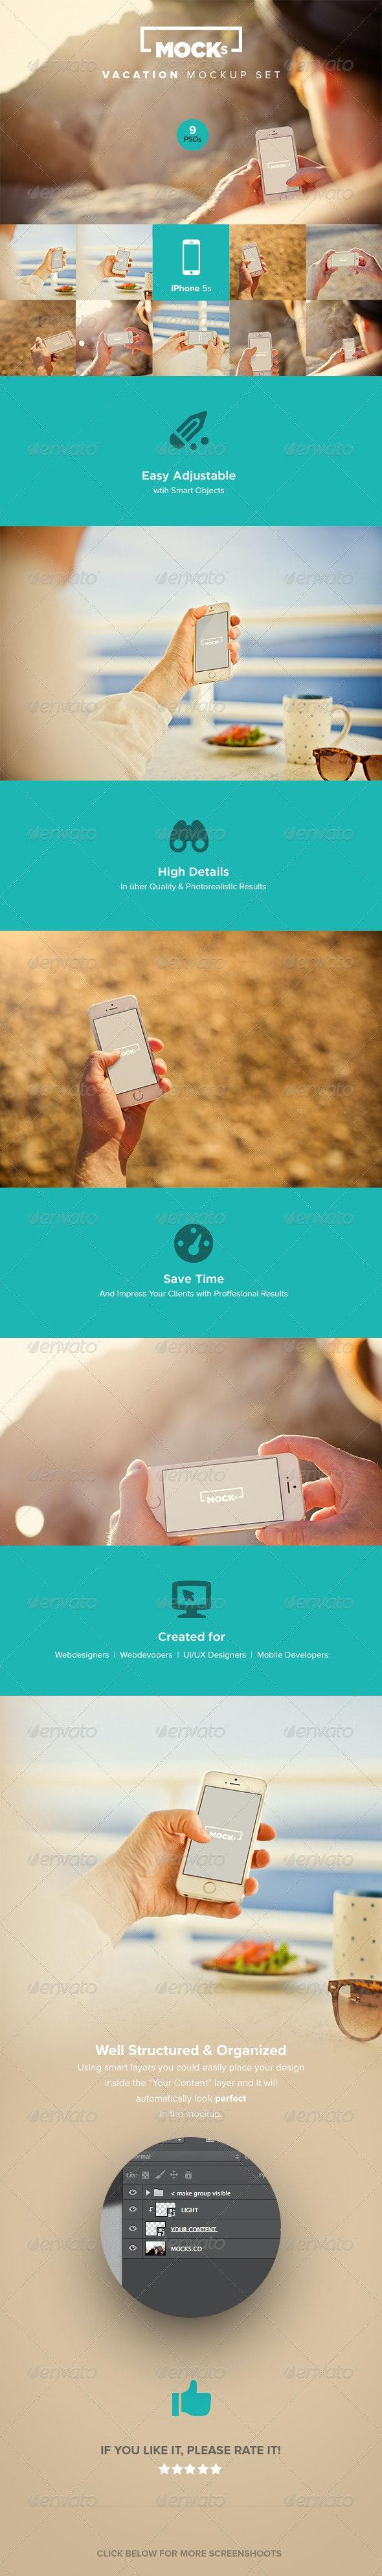 Photorealistic iPhone Mockup Templates - Mobile Displays